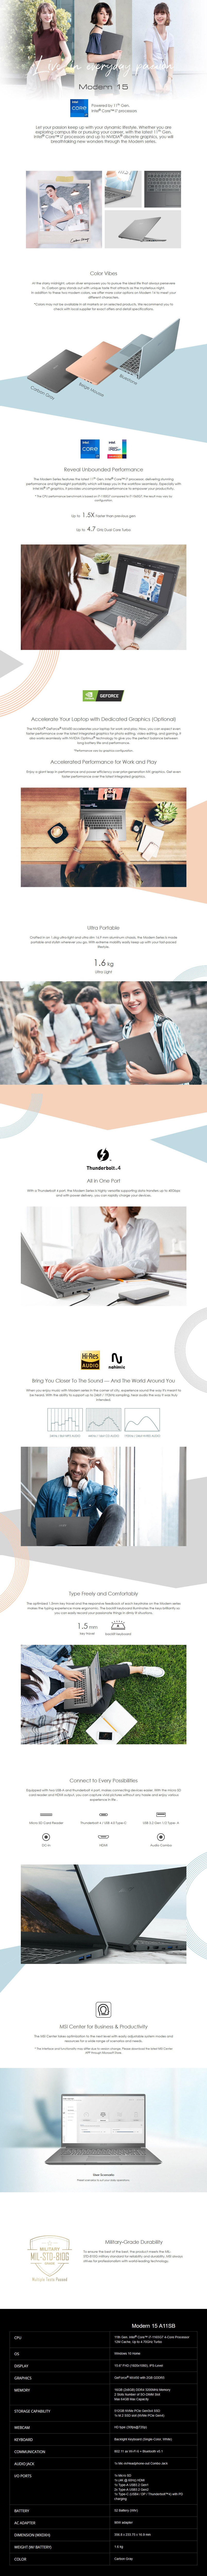 msi-modern-15-a11sb-156-laptop-i71165g7-16gb-512gb-mx450-w10h-ac40716-1.jpg